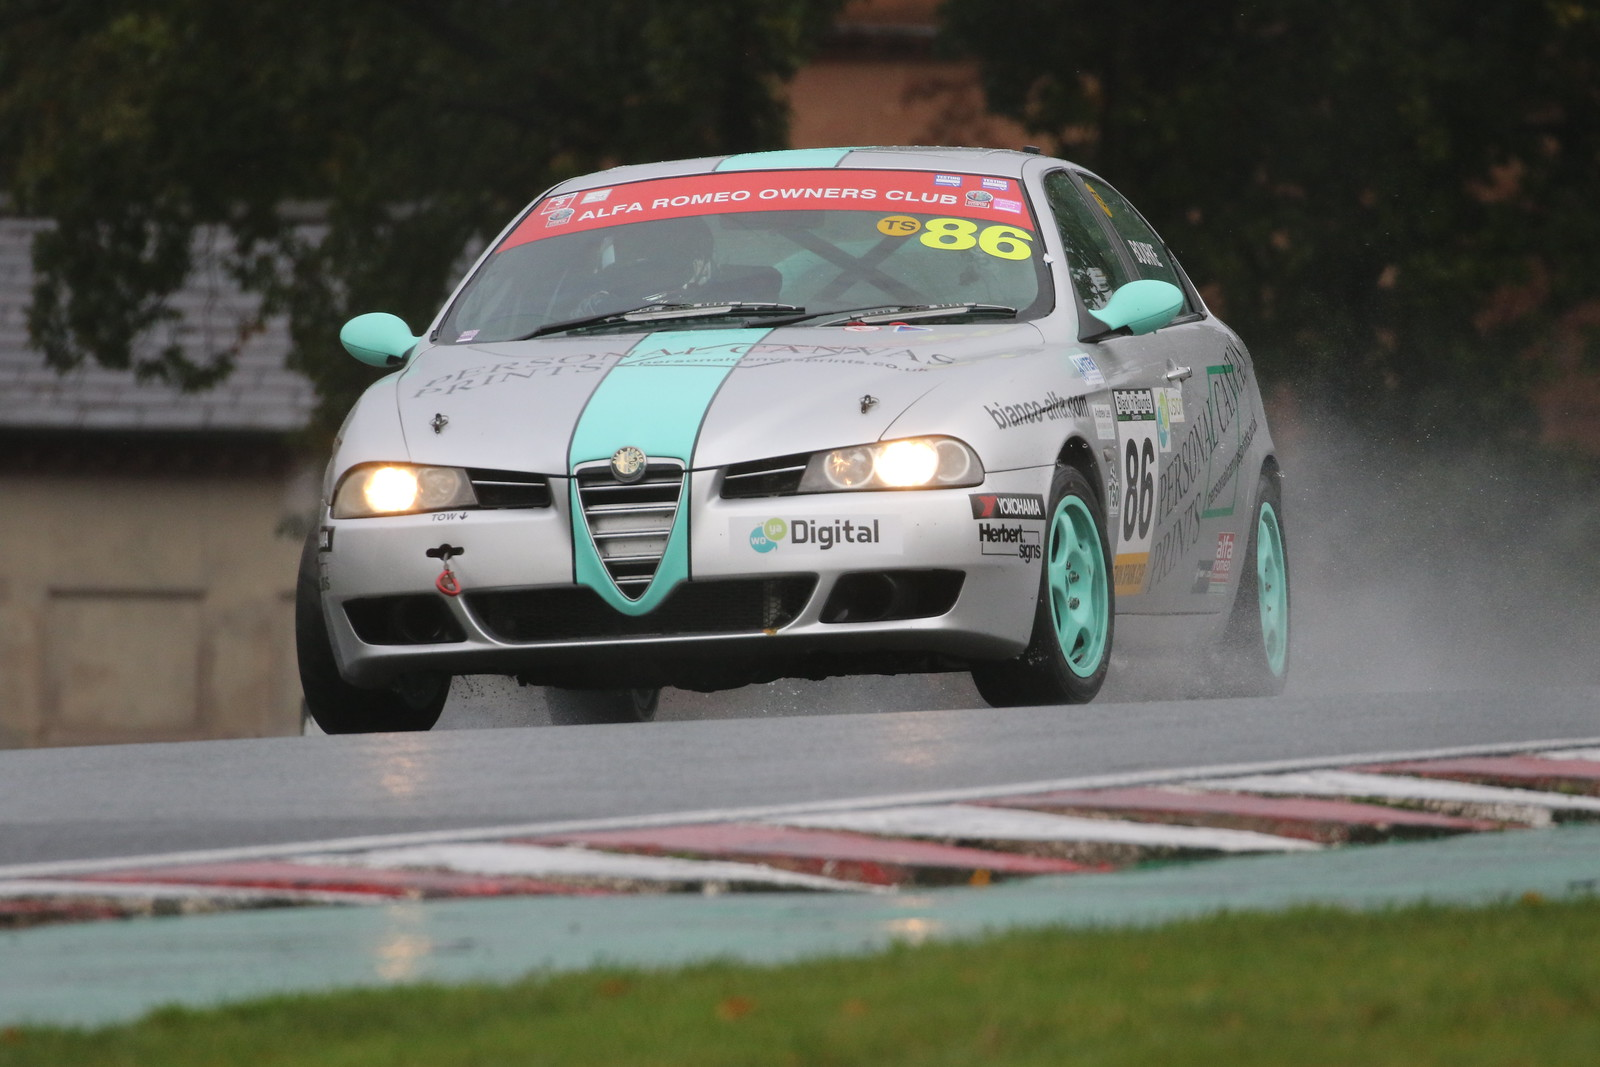 Championship Sponsors Rally Round the Alfa Romeo Championship